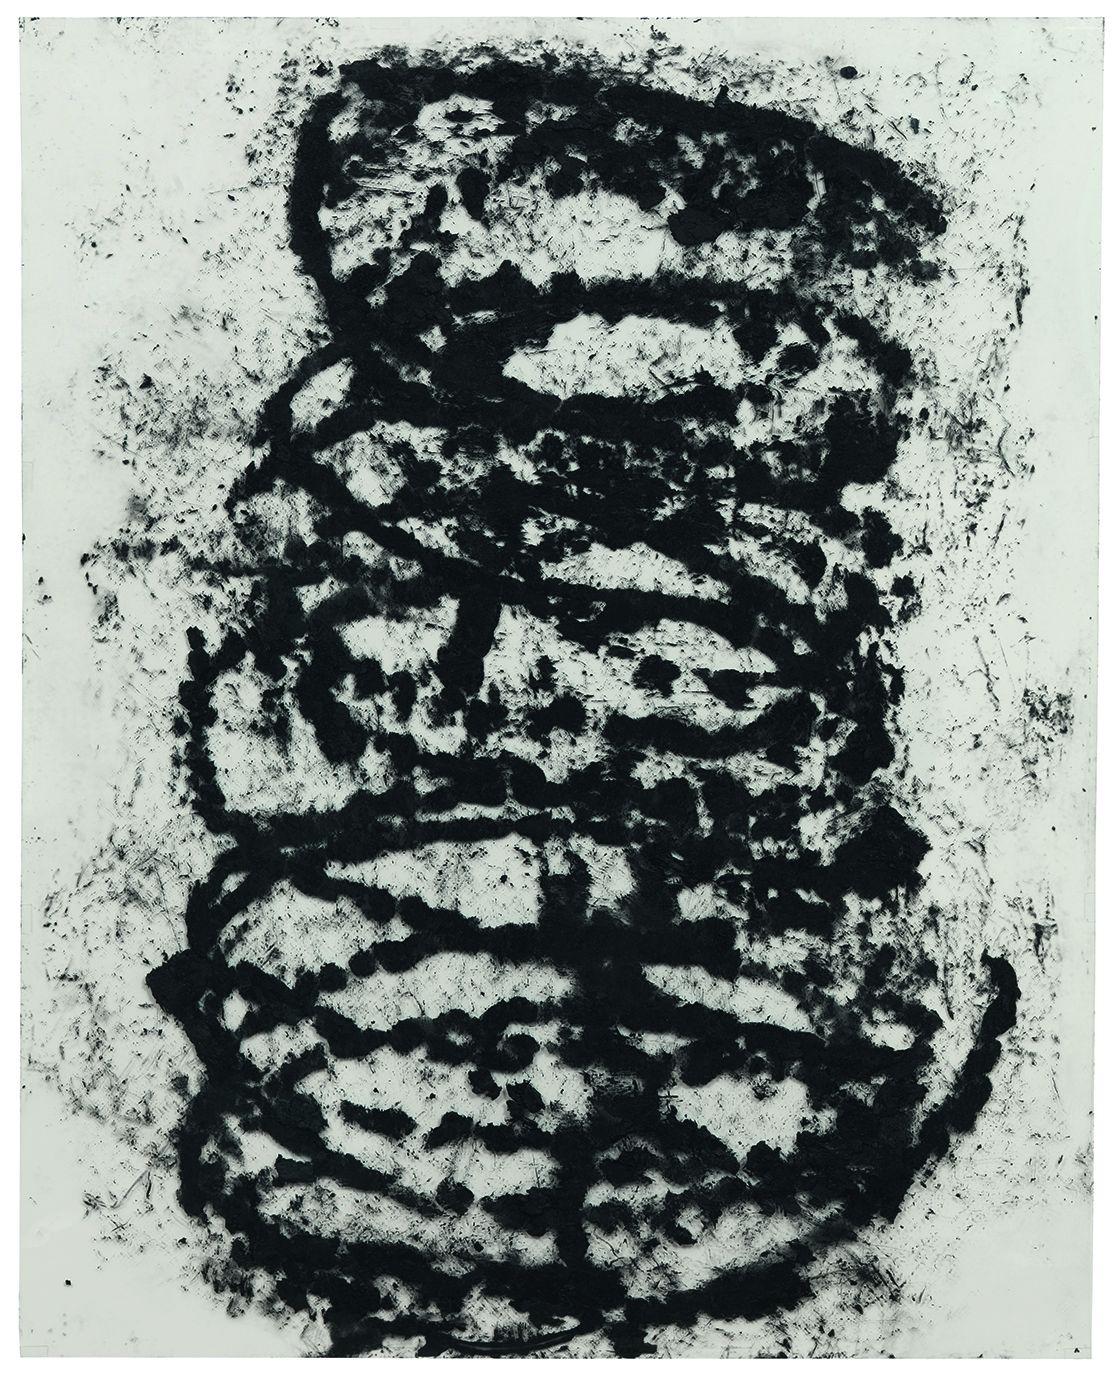 Richard Serra,Transparency #16, 2012.